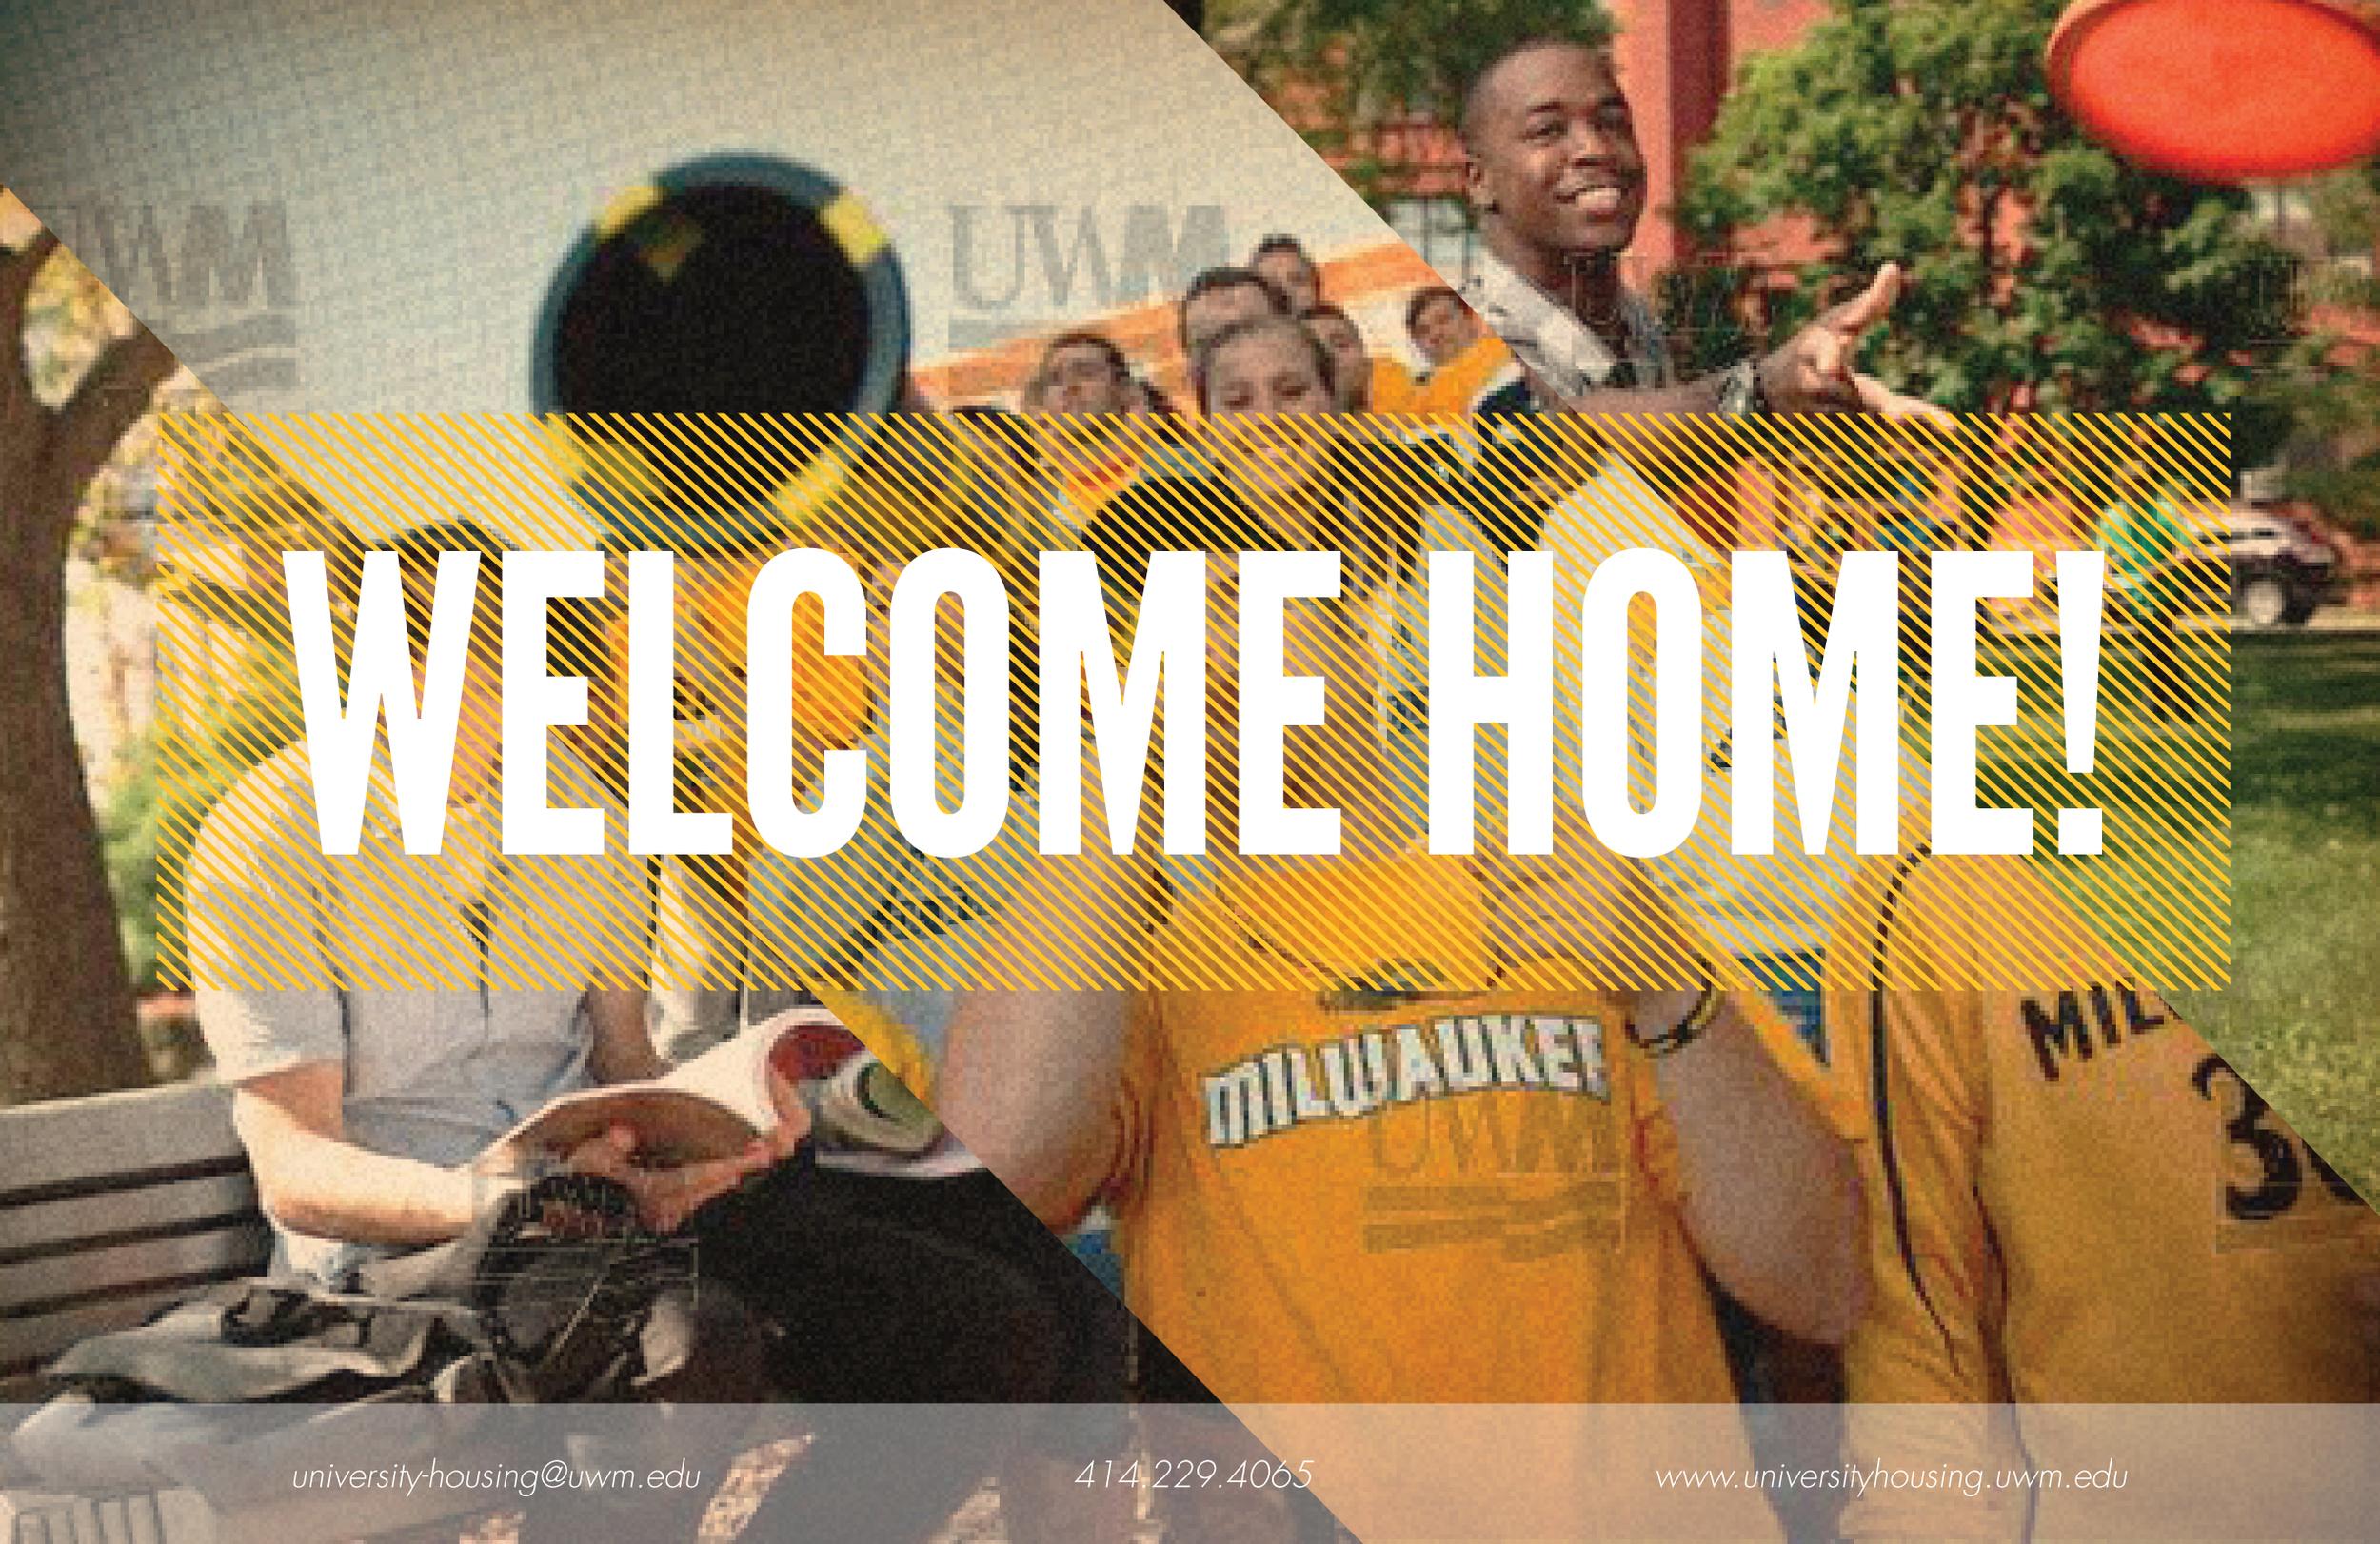 uwm welcome home postcard